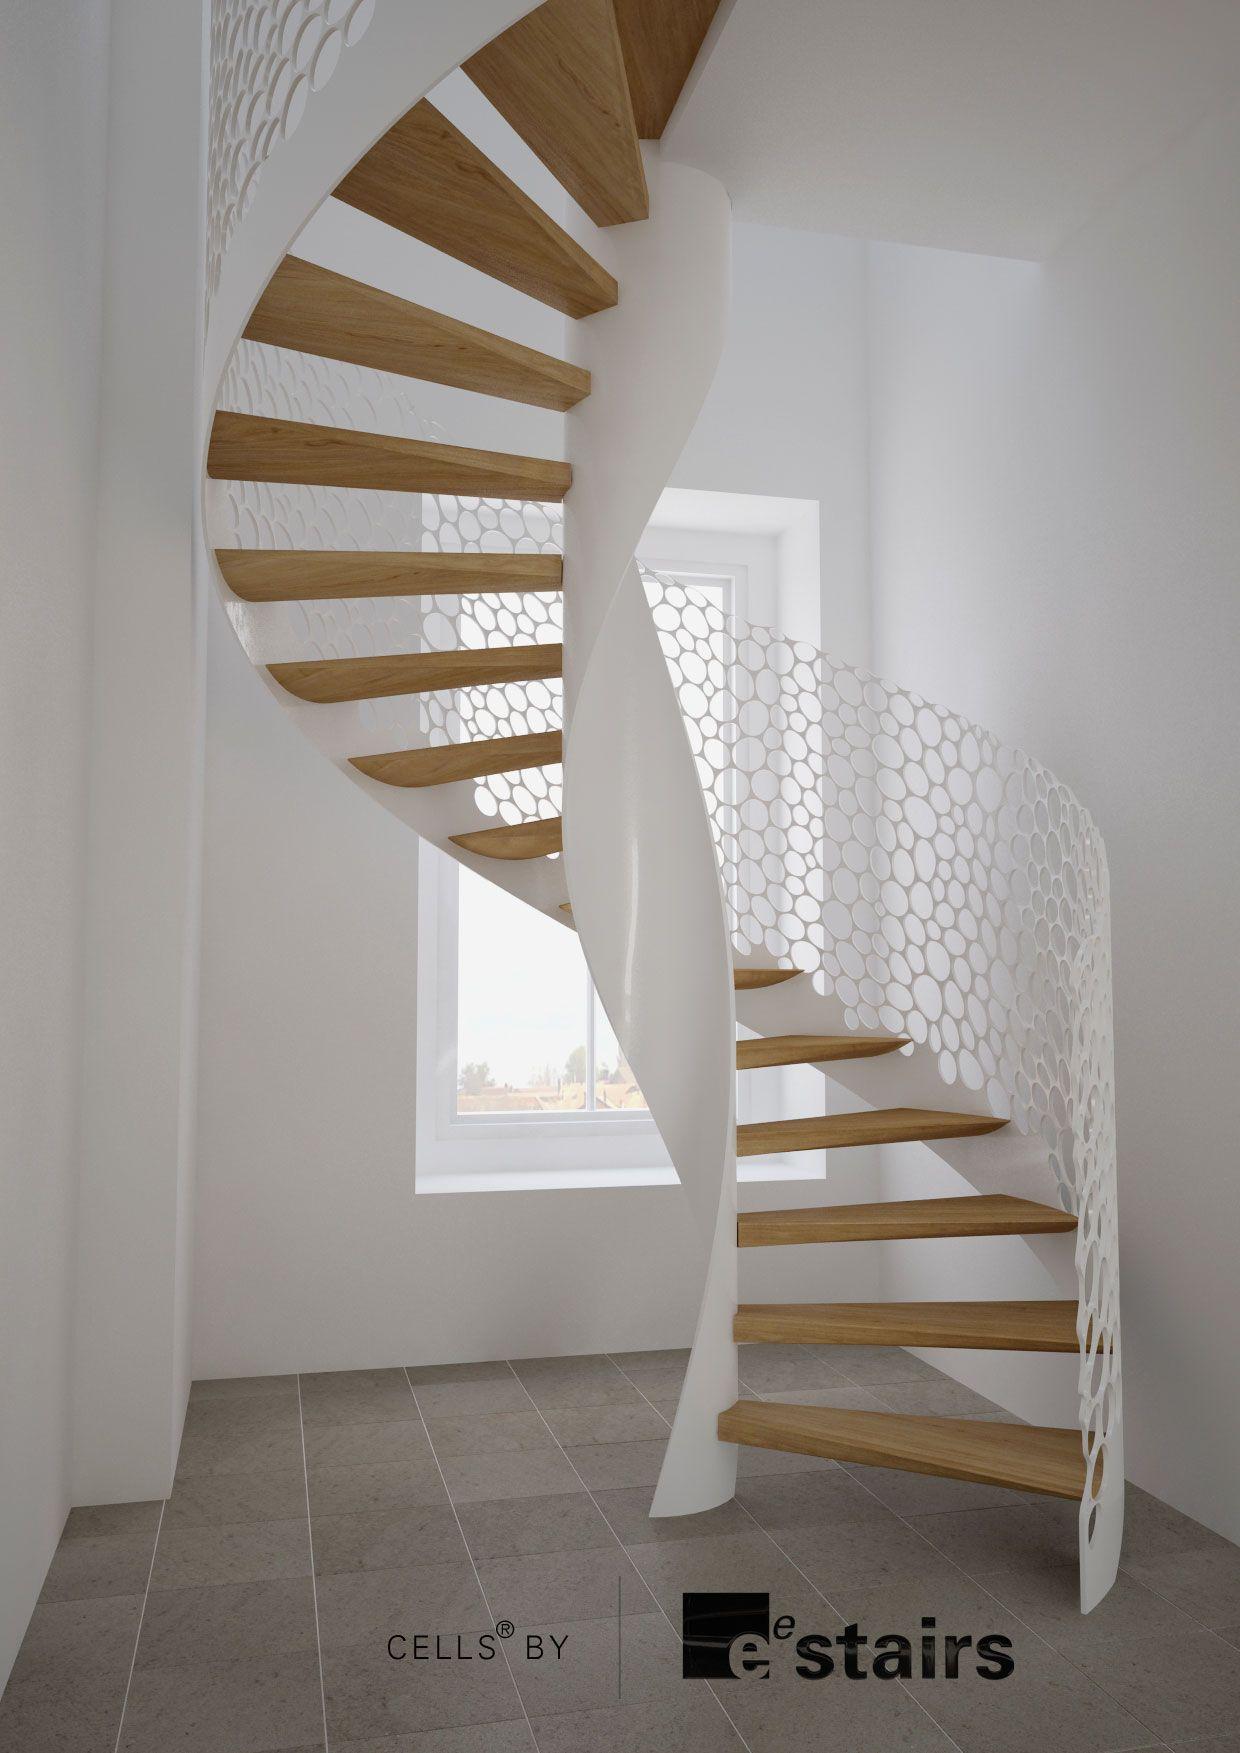 Home geländer design einfach cells  eedesign  staircases  pinterest  staircases steel and